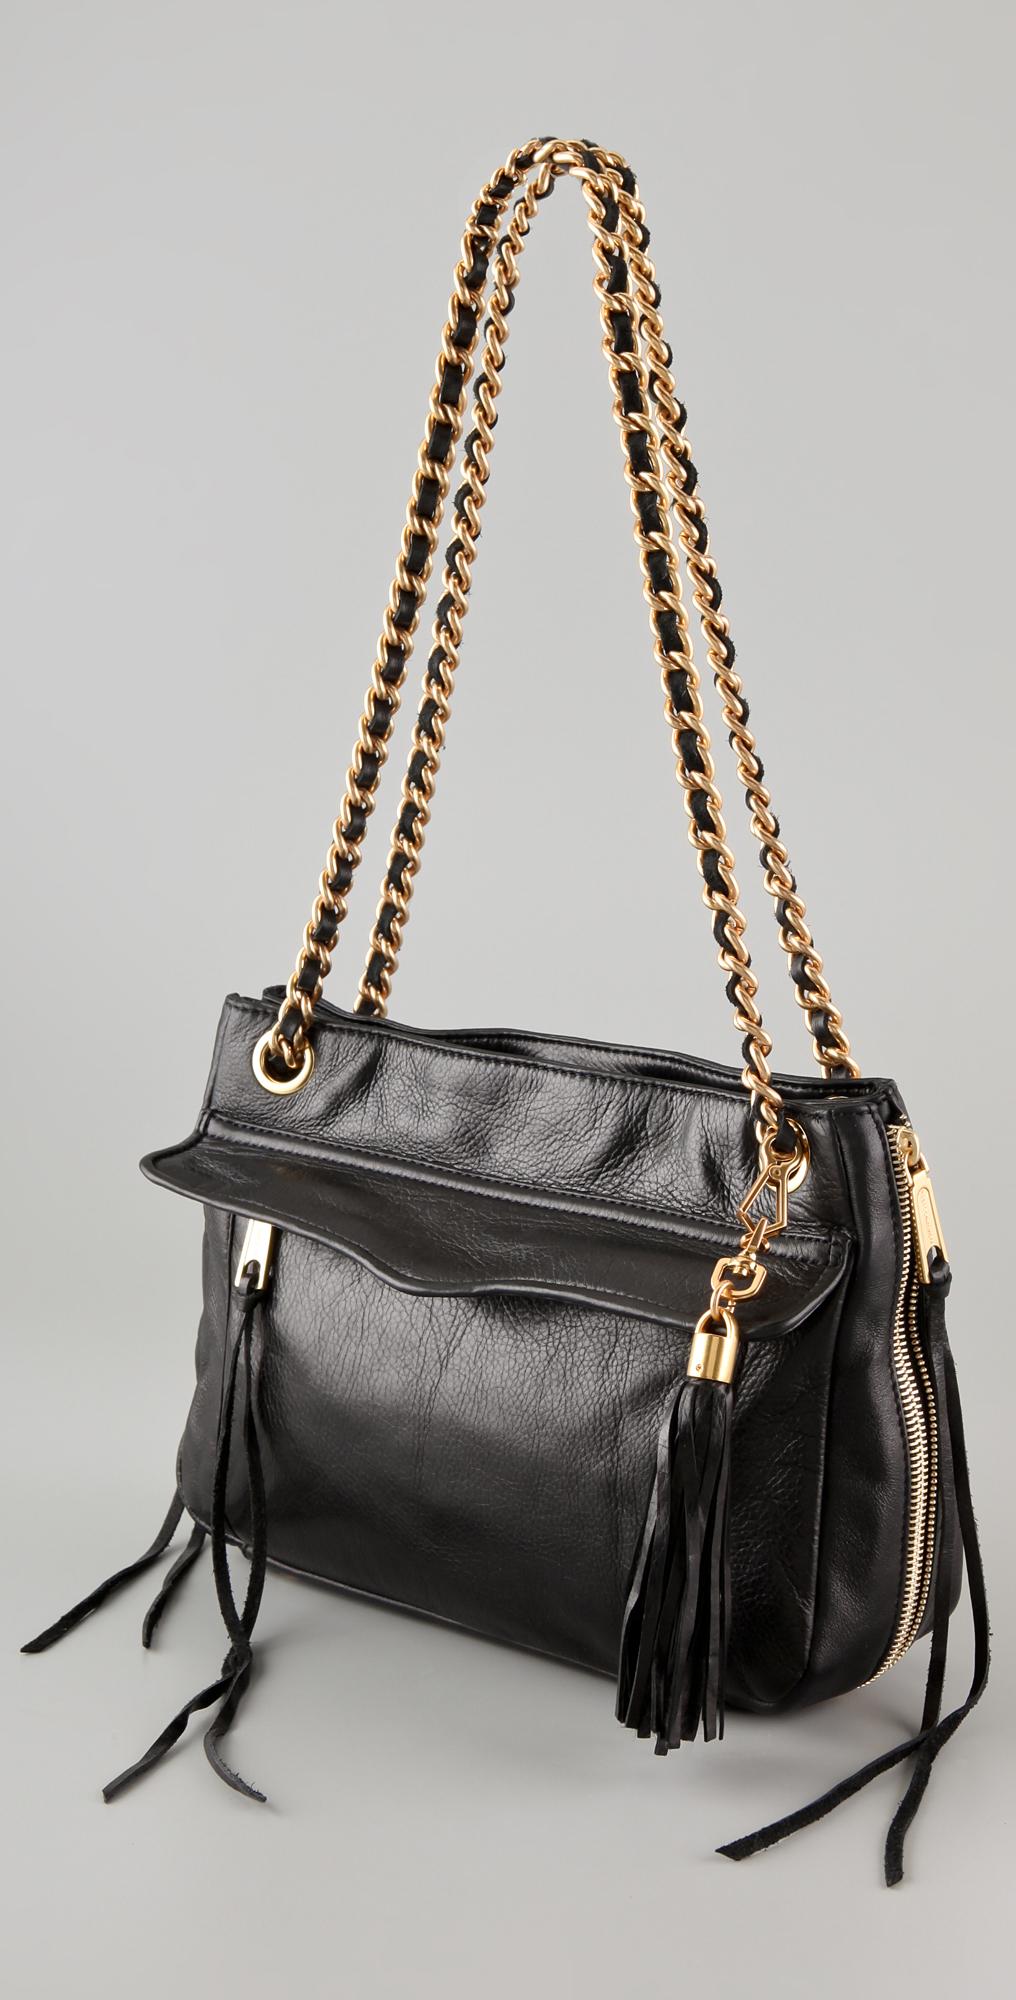 db96b36366c4 Rebecca Minkoff Swing Shoulder Bag